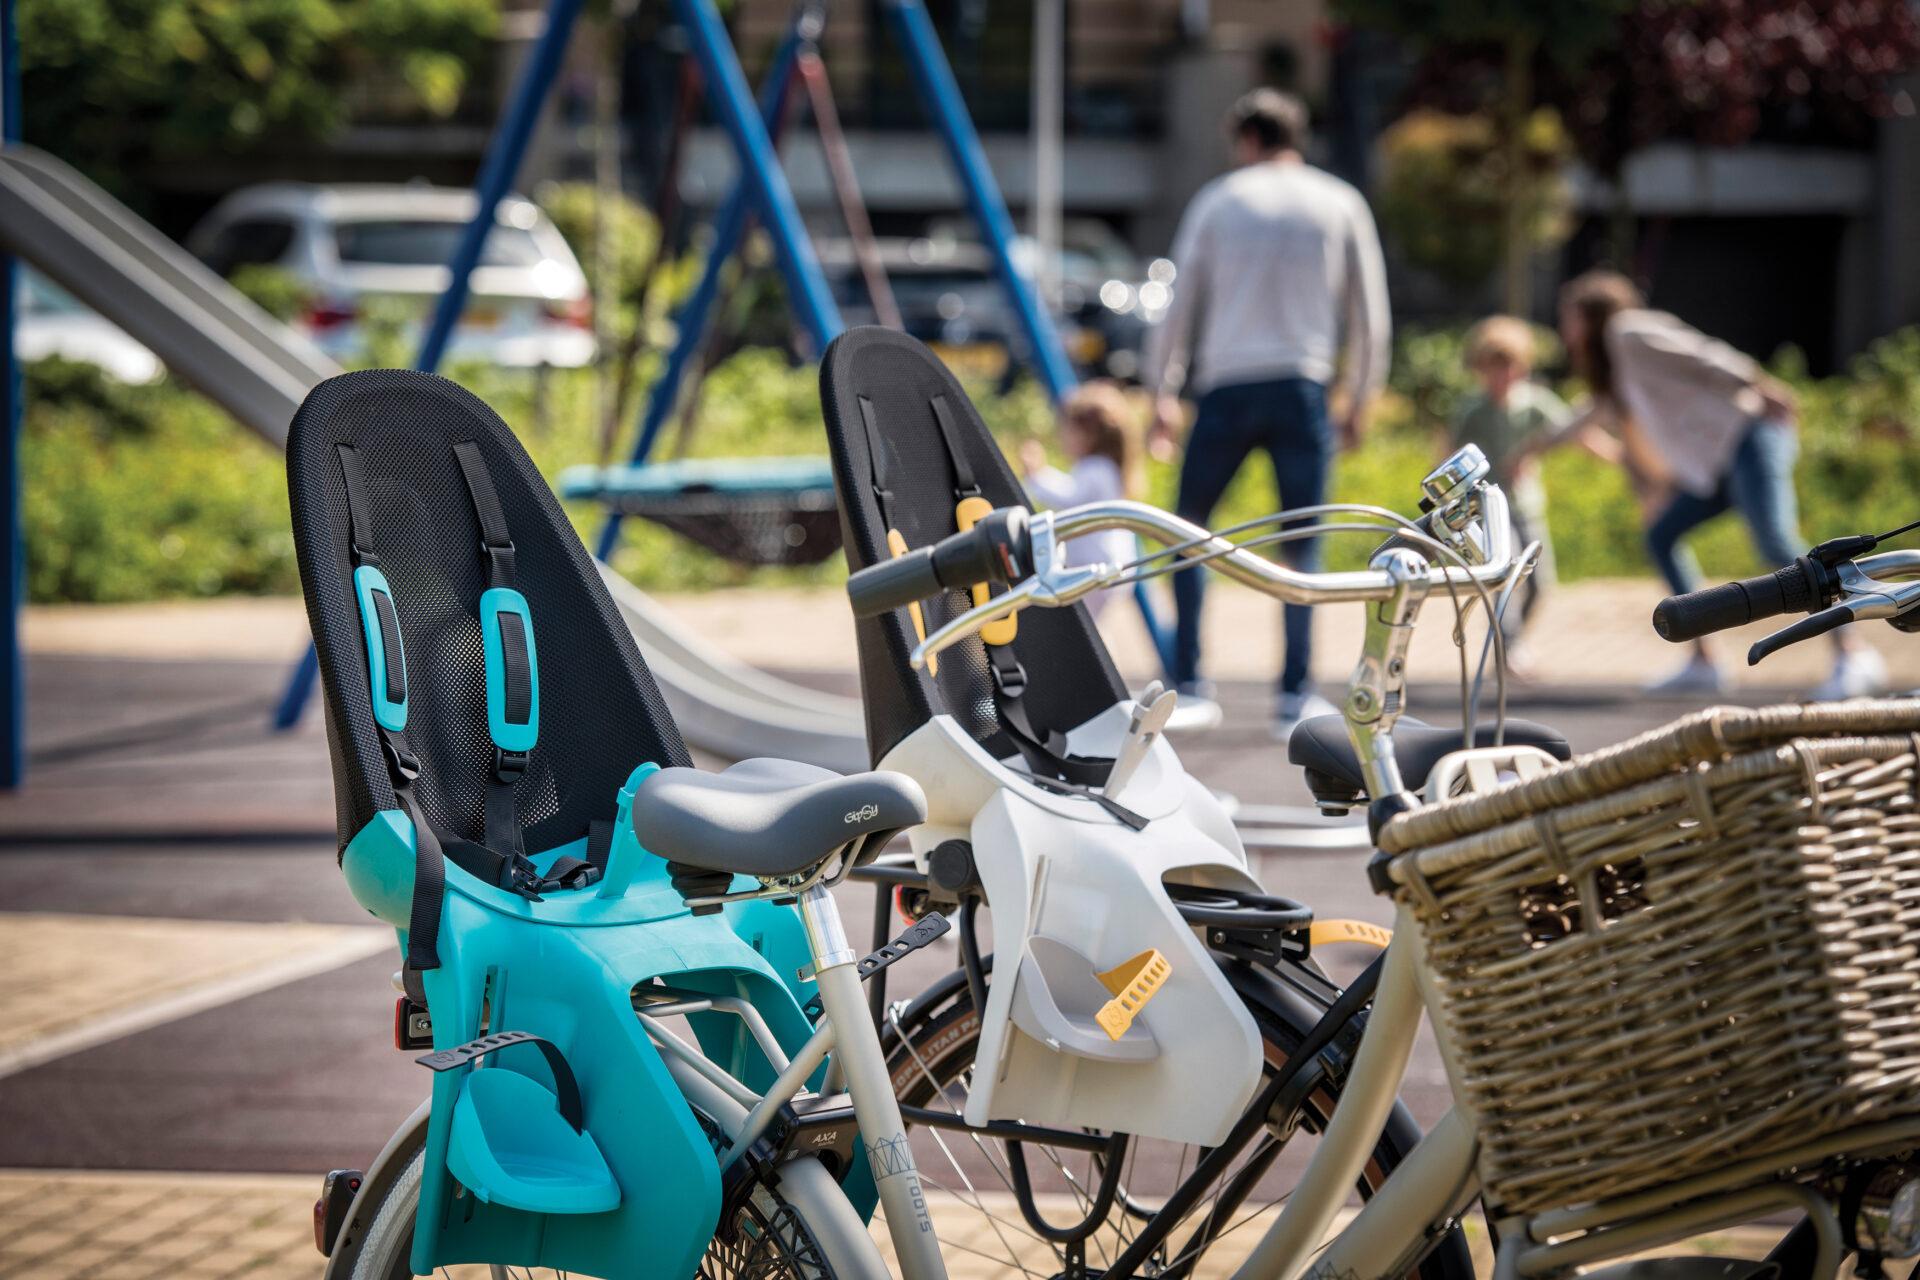 Beste Fietsstoeltje kopen: waar let je op? – 24Baby.nl JB-38